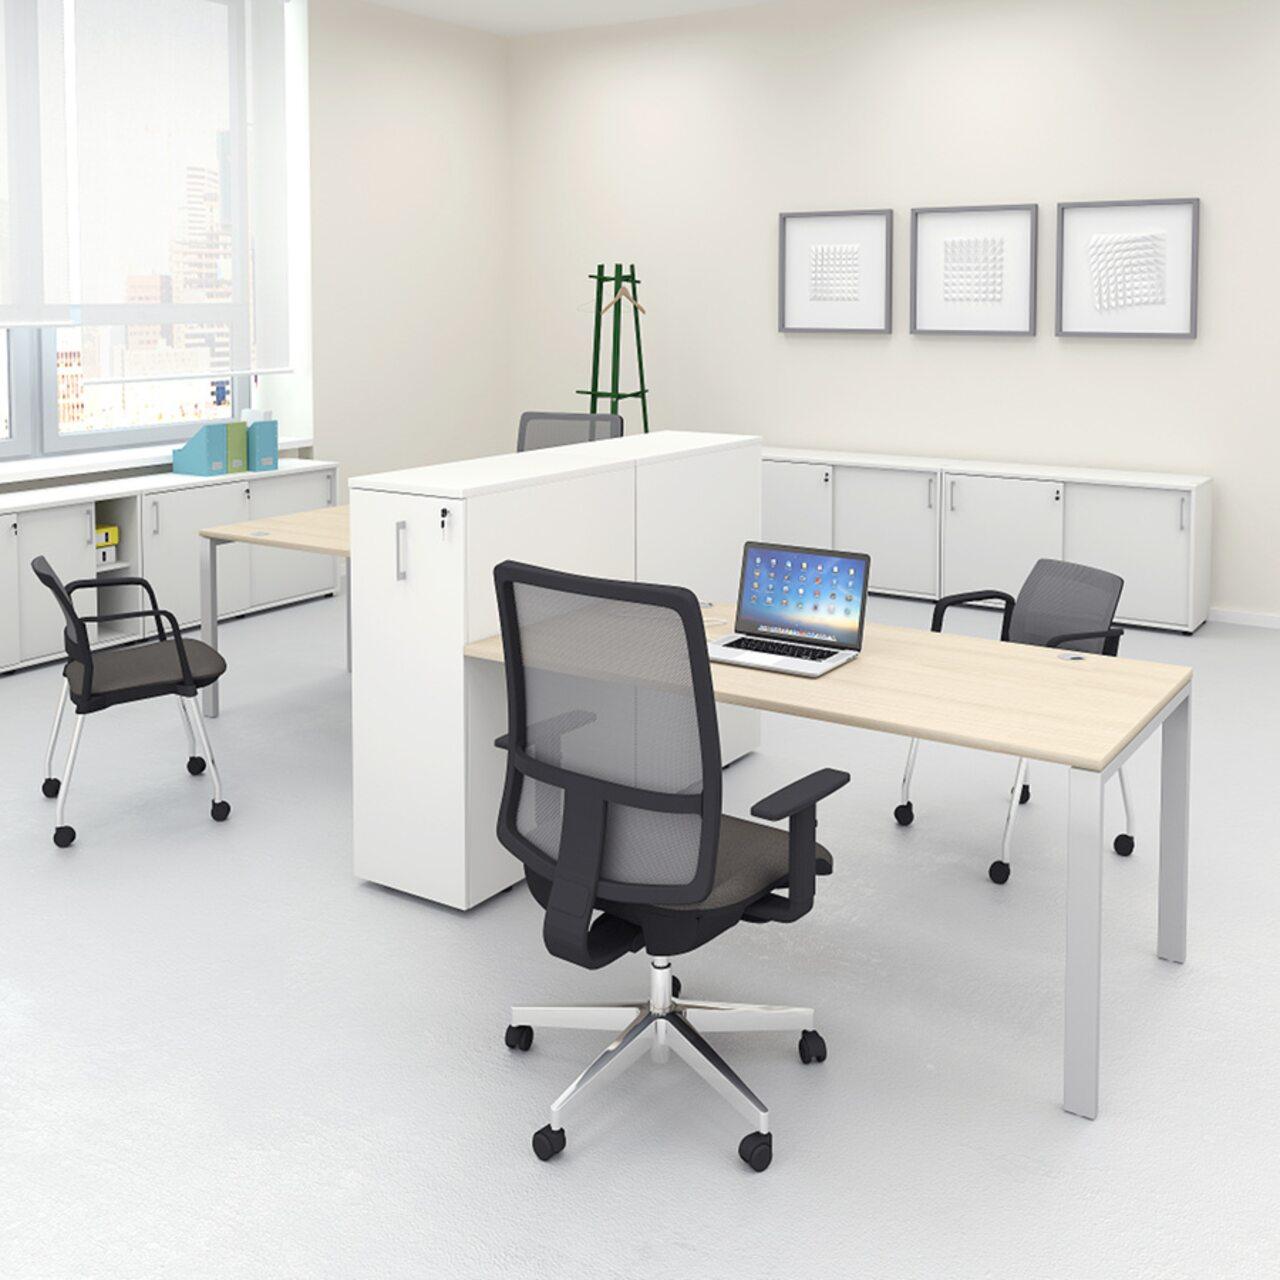 Мебель для персонала Strike - фото 8